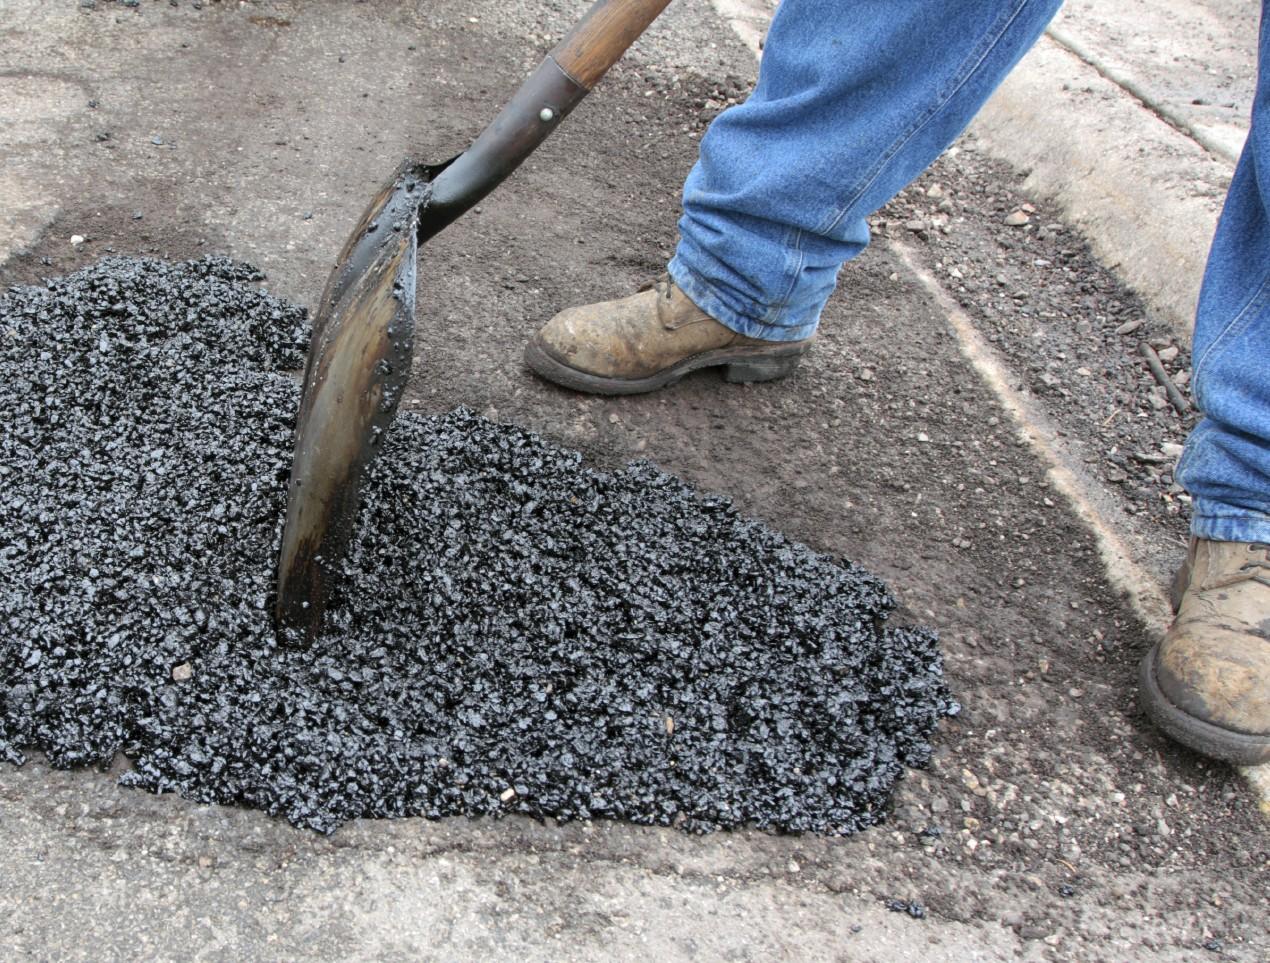 Trabajar con asfalto de manera segura